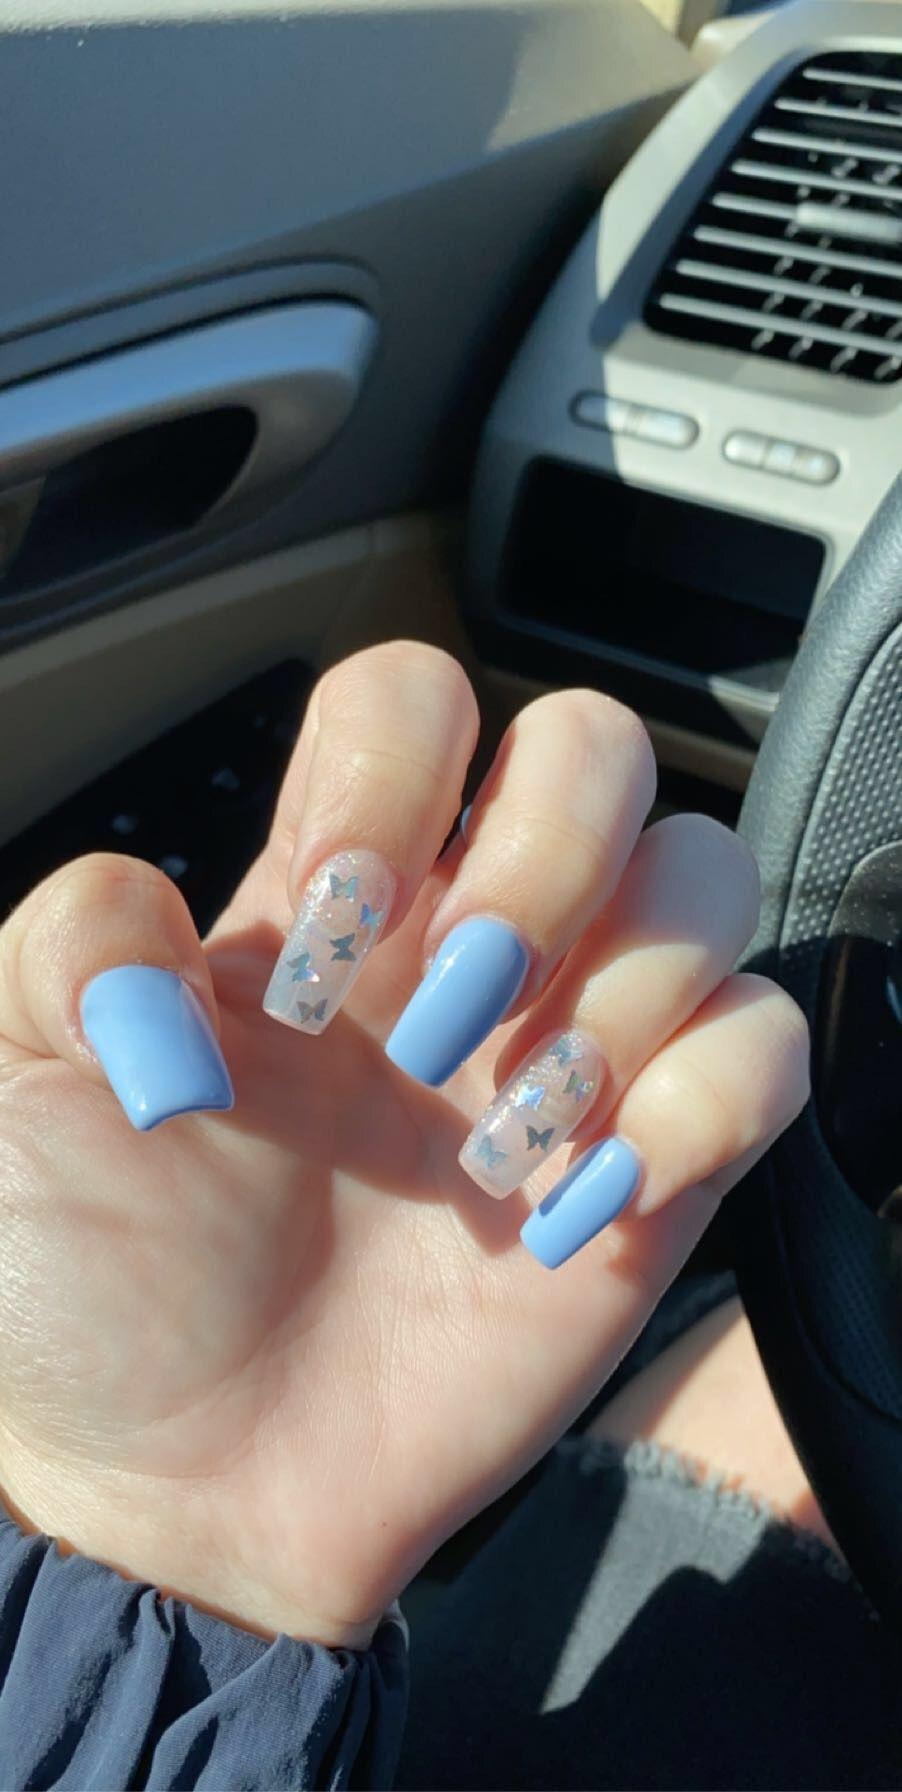 Pretty In Butterflies Short Acrylic Nails Designs Blue Glitter Nails Acrylic Nails Coffin Short